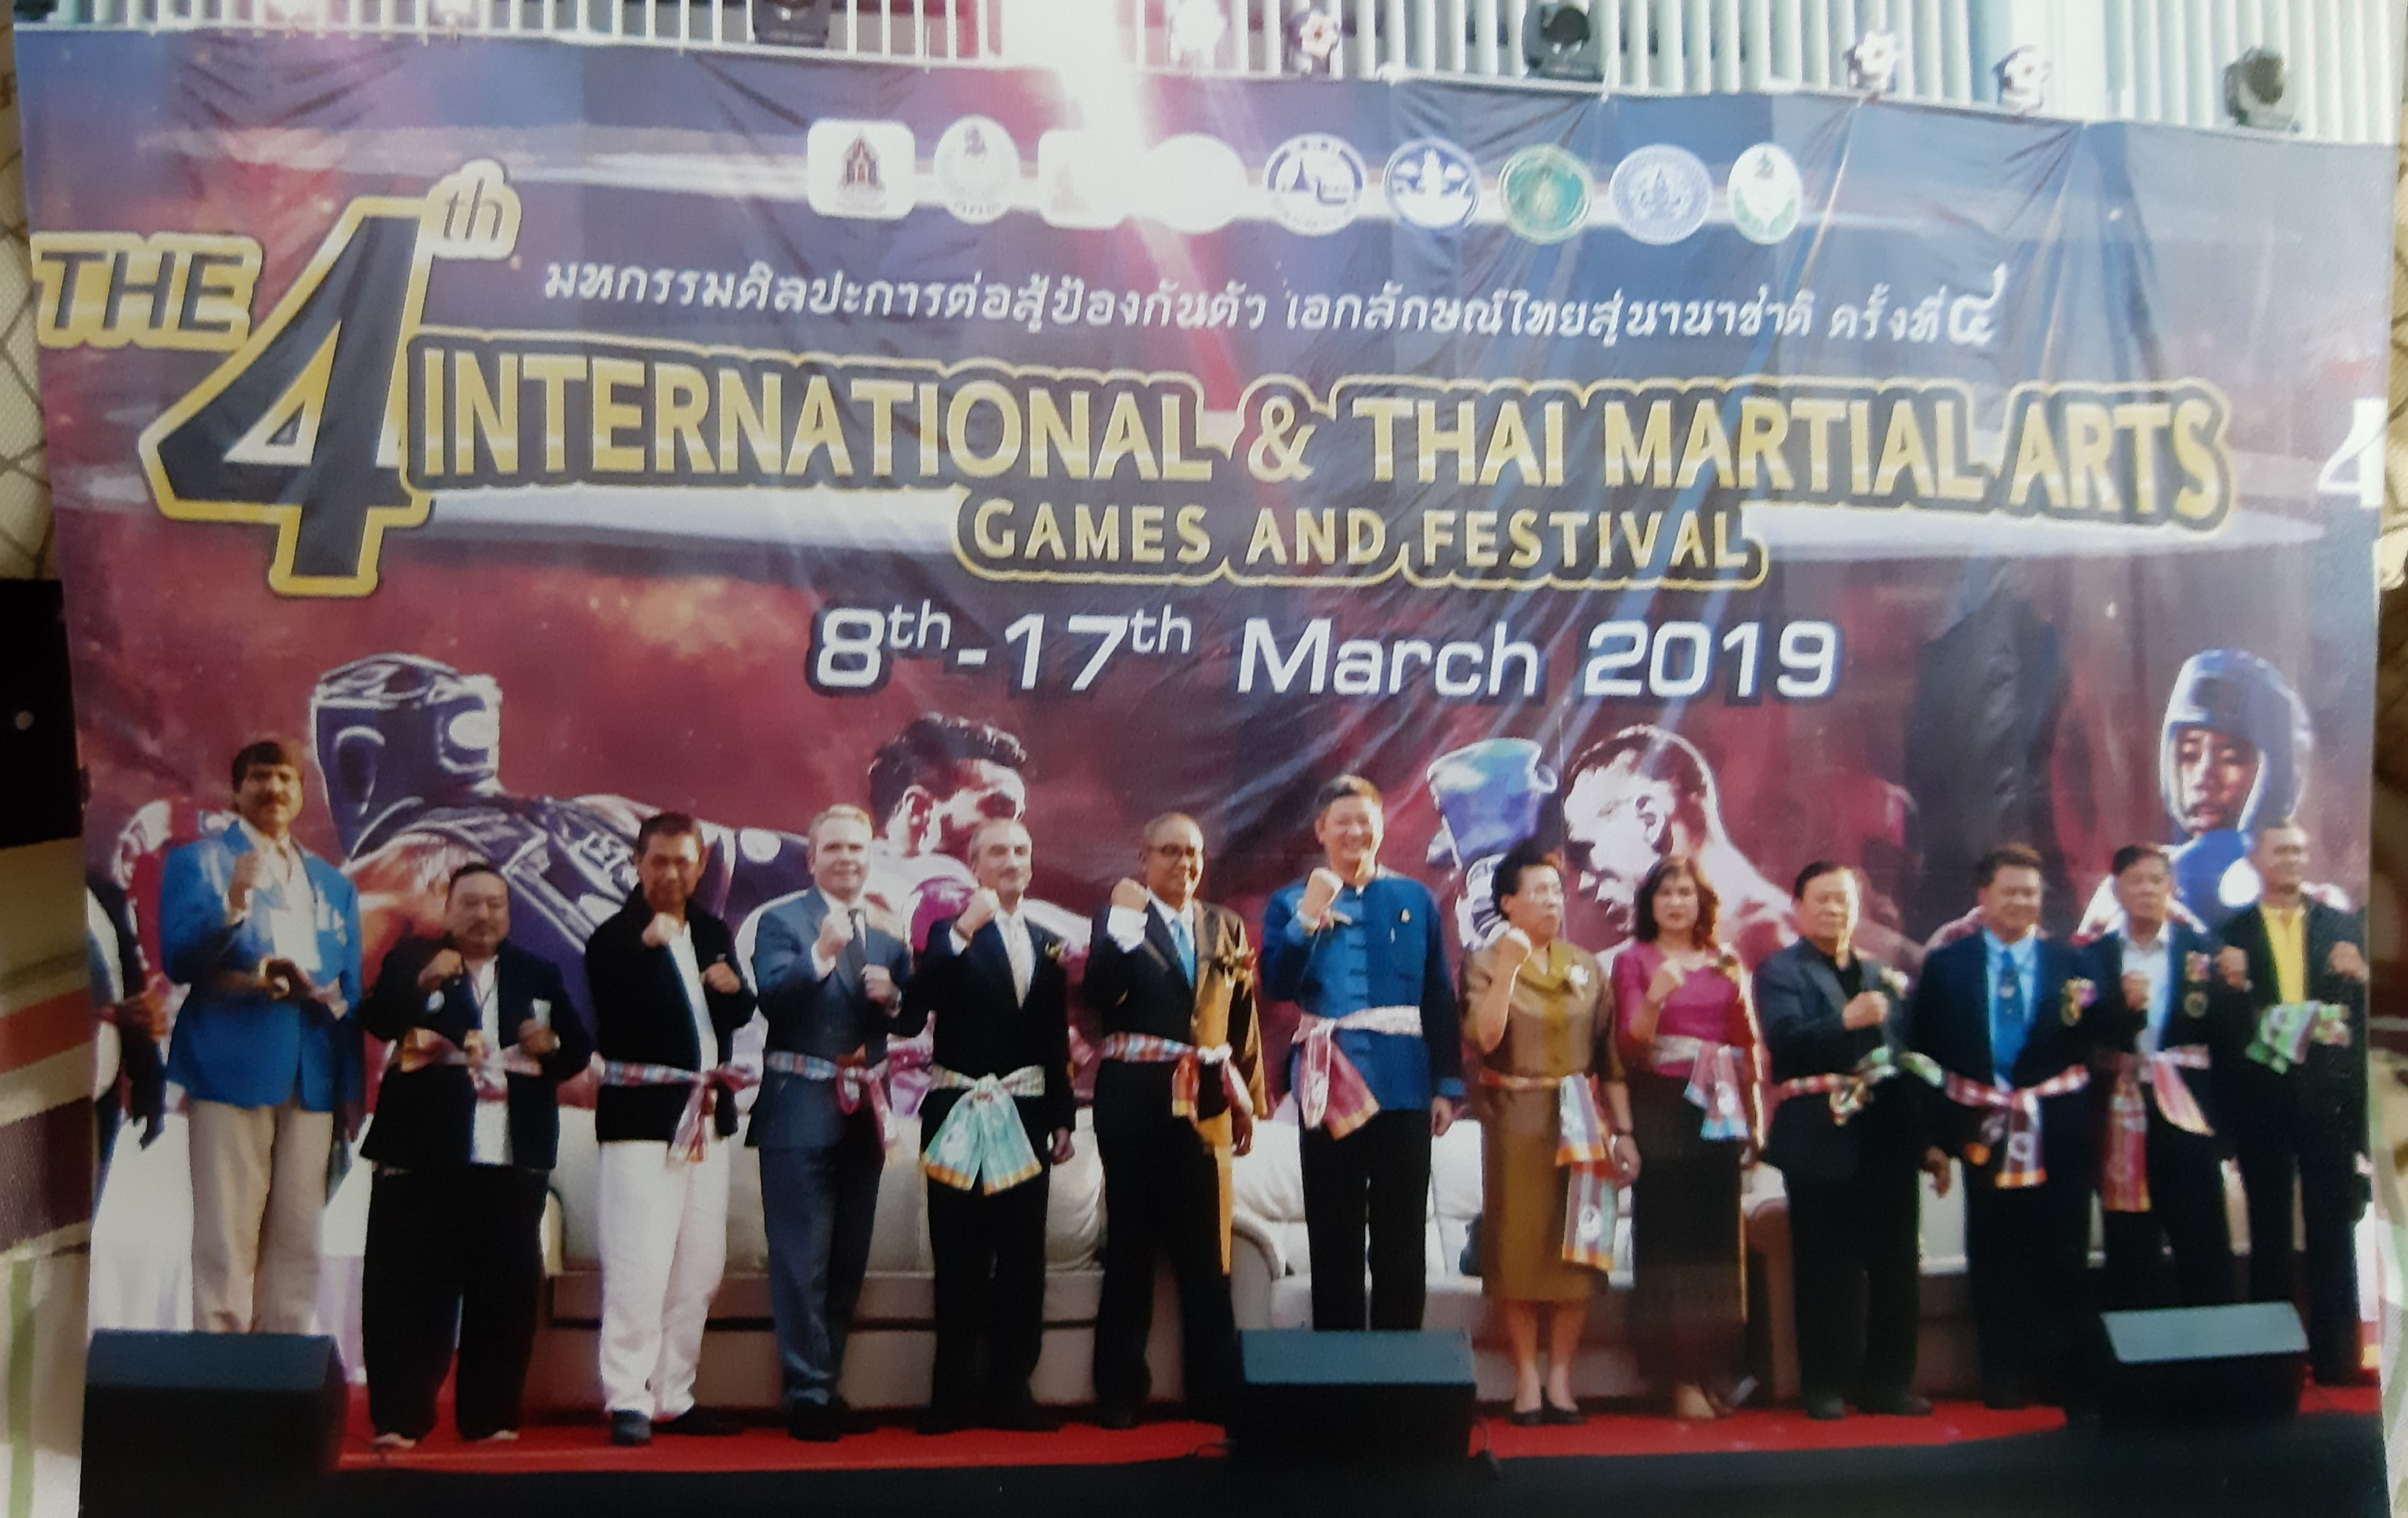 4th INTERNATIONAL & THAI MARTIAL ARTS GAMES AND FESTIVAL - 2019